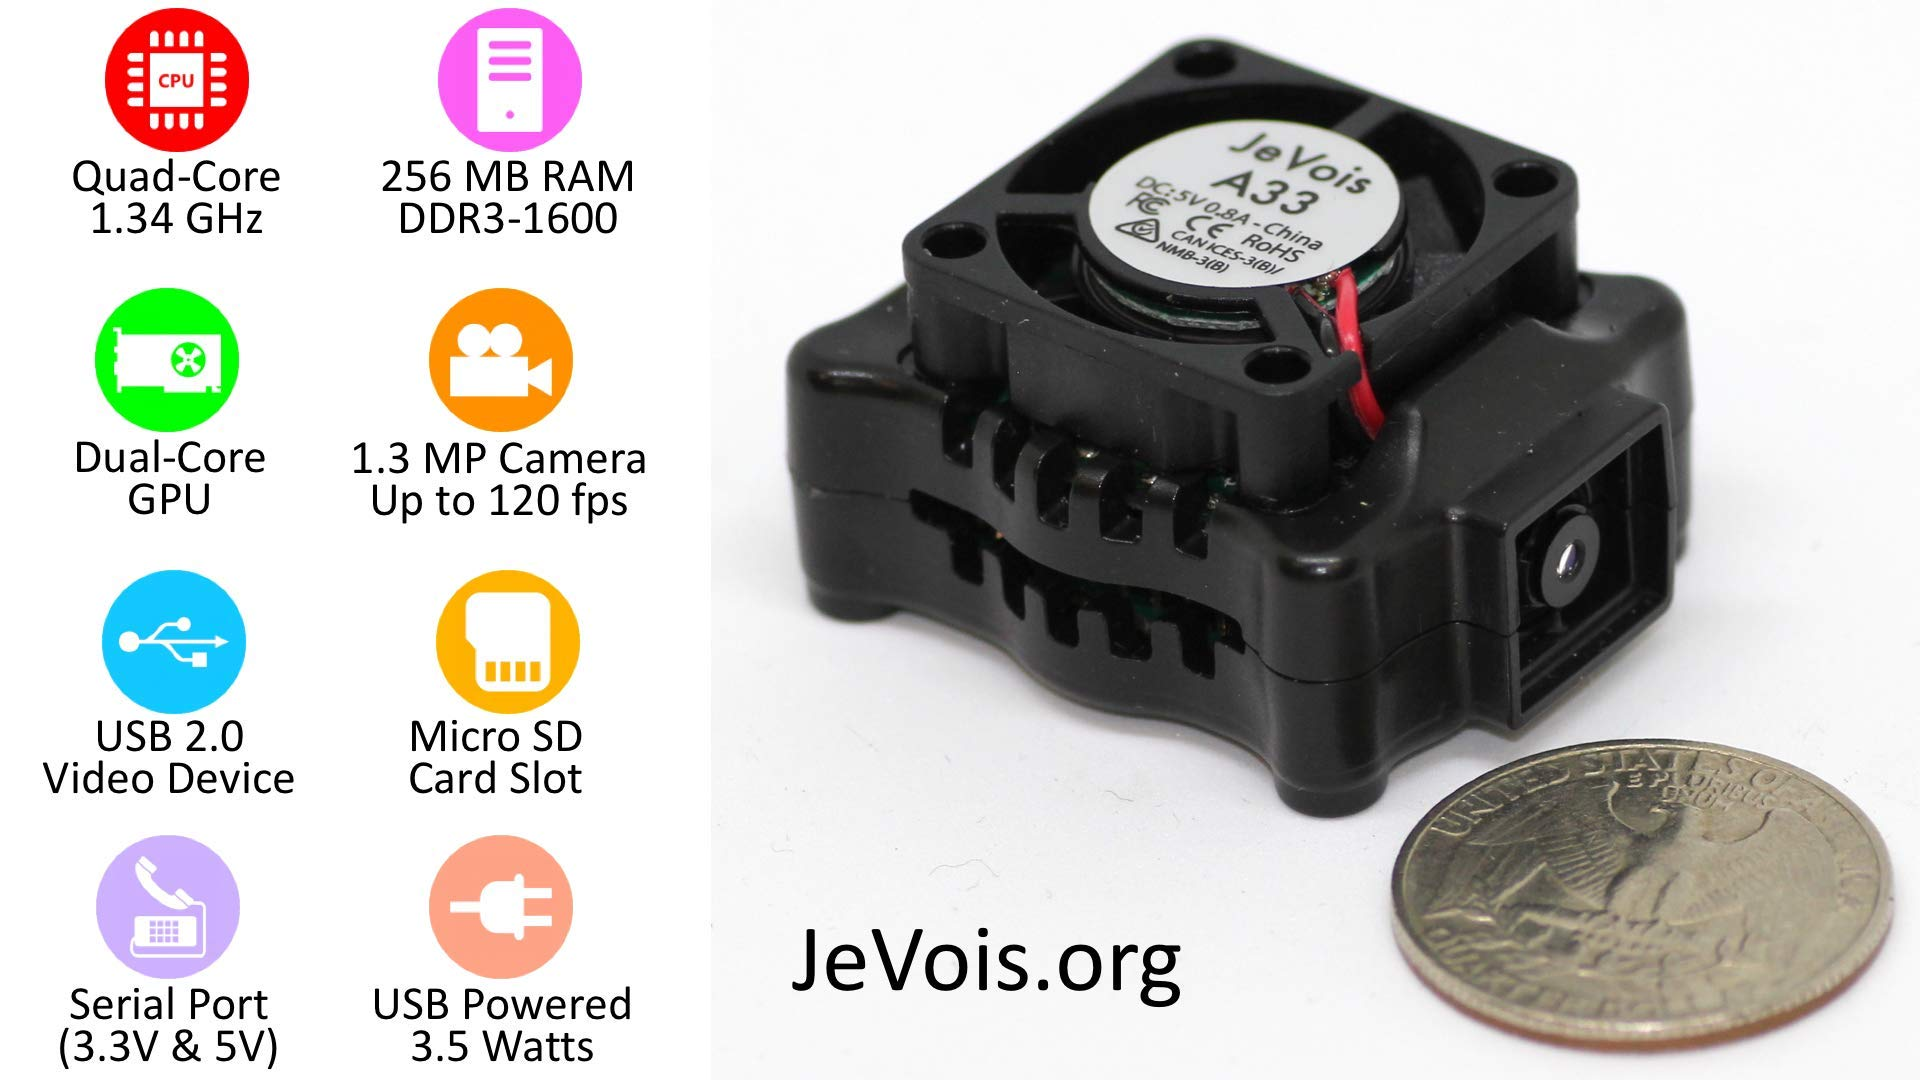 JeVois-A33 Quad-Core Smart Machine Vision Camera for PC, Mac, Linux, Arduino, Raspberry Pi - Black - Hacker KIT